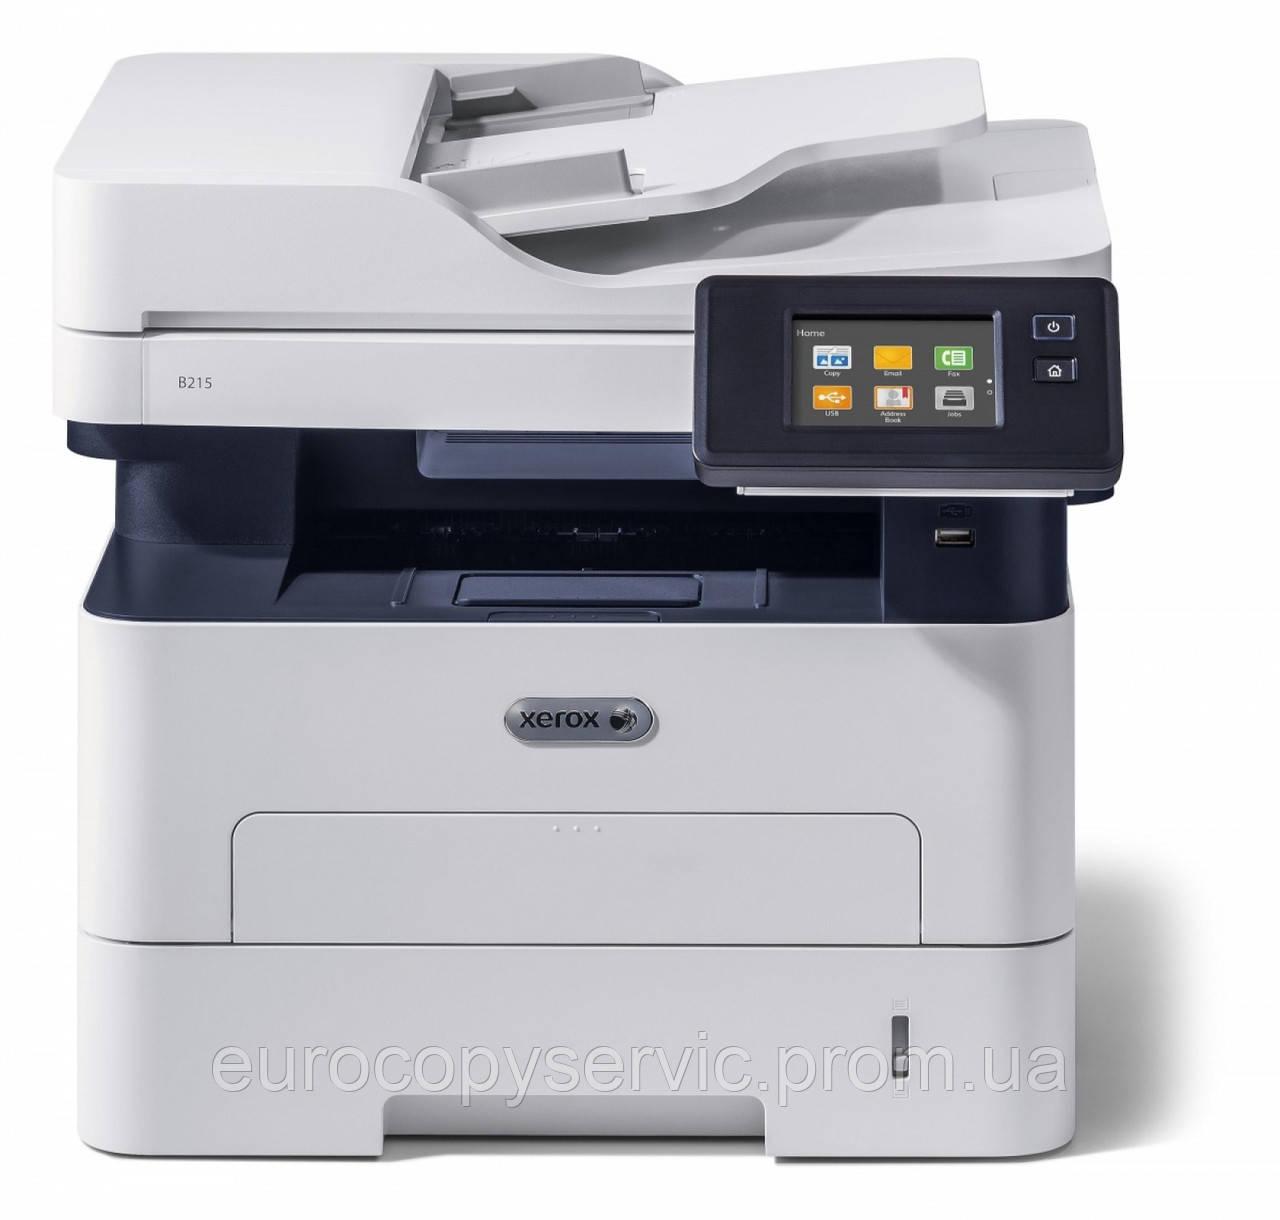 БФП Xerox B215 А4 ч/б (B215V_DNI) з Wi-Fi